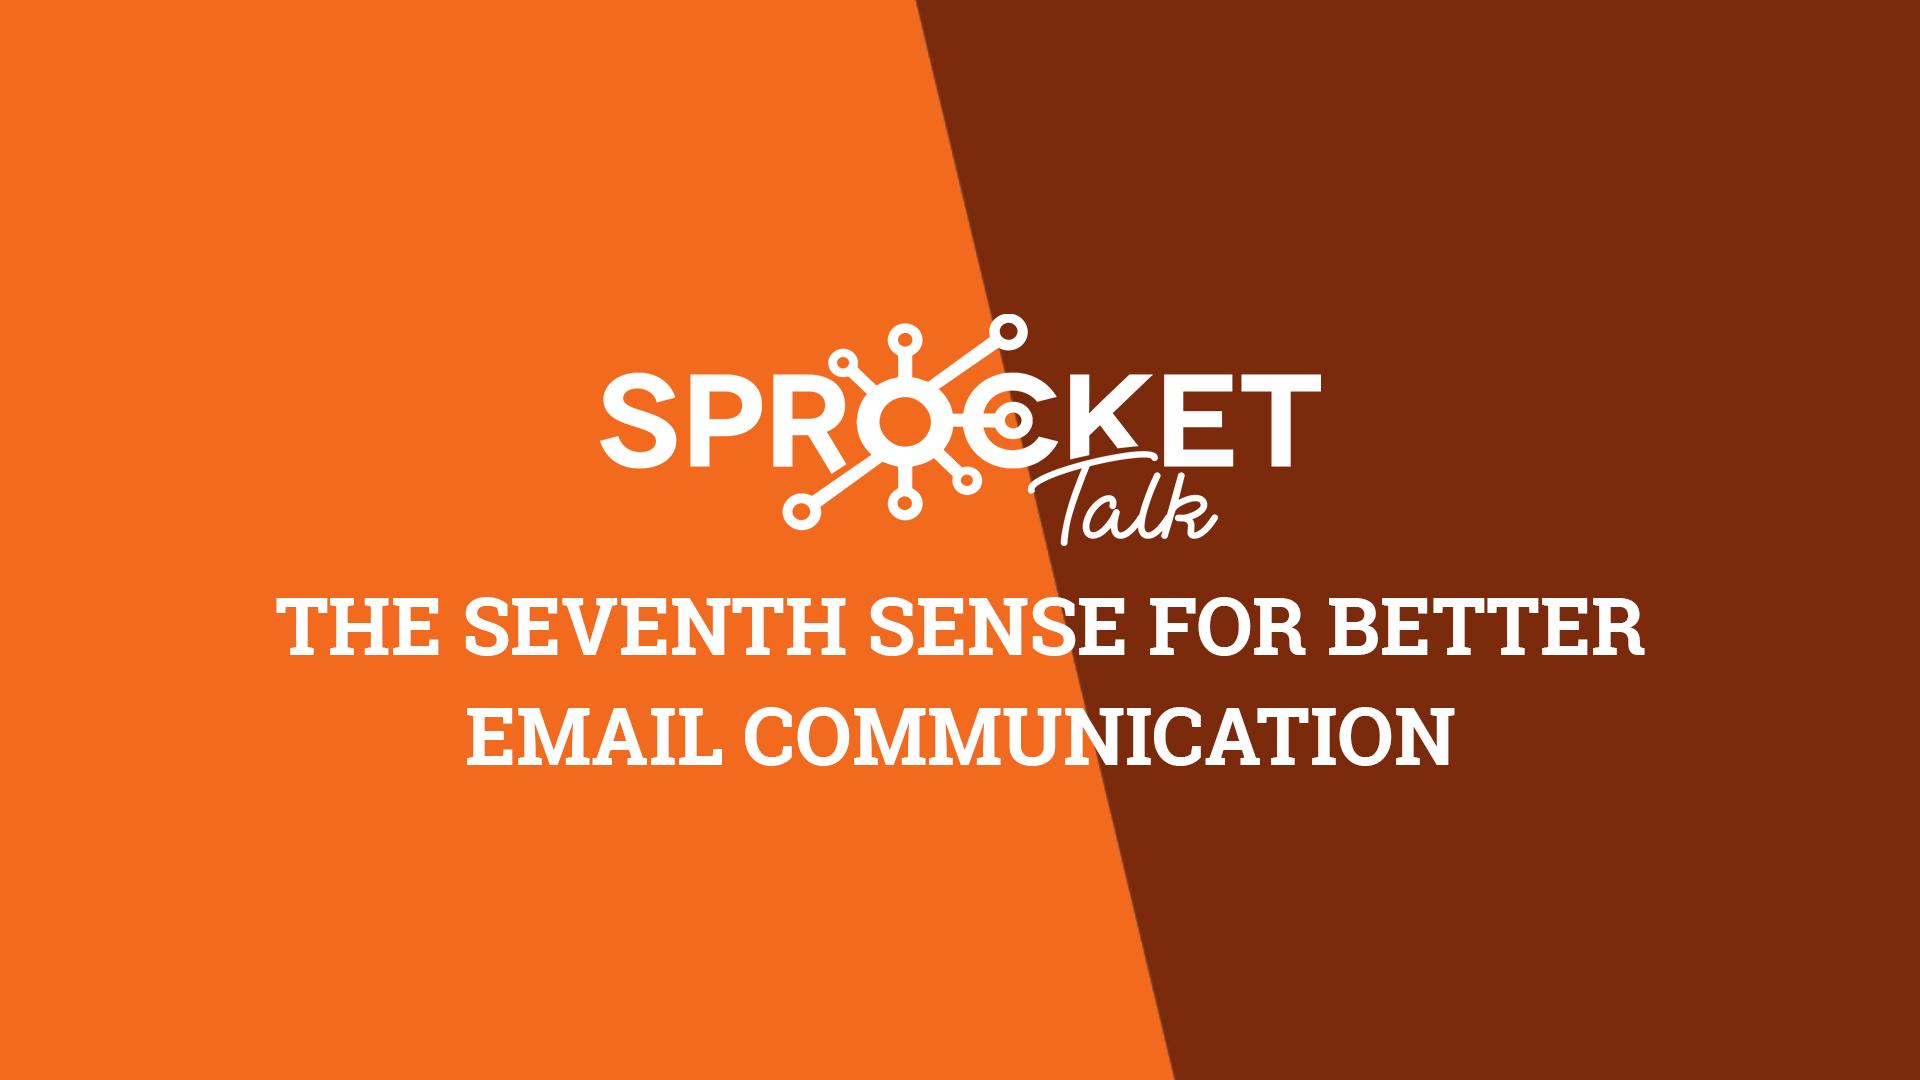 The seventh sense for better email communication